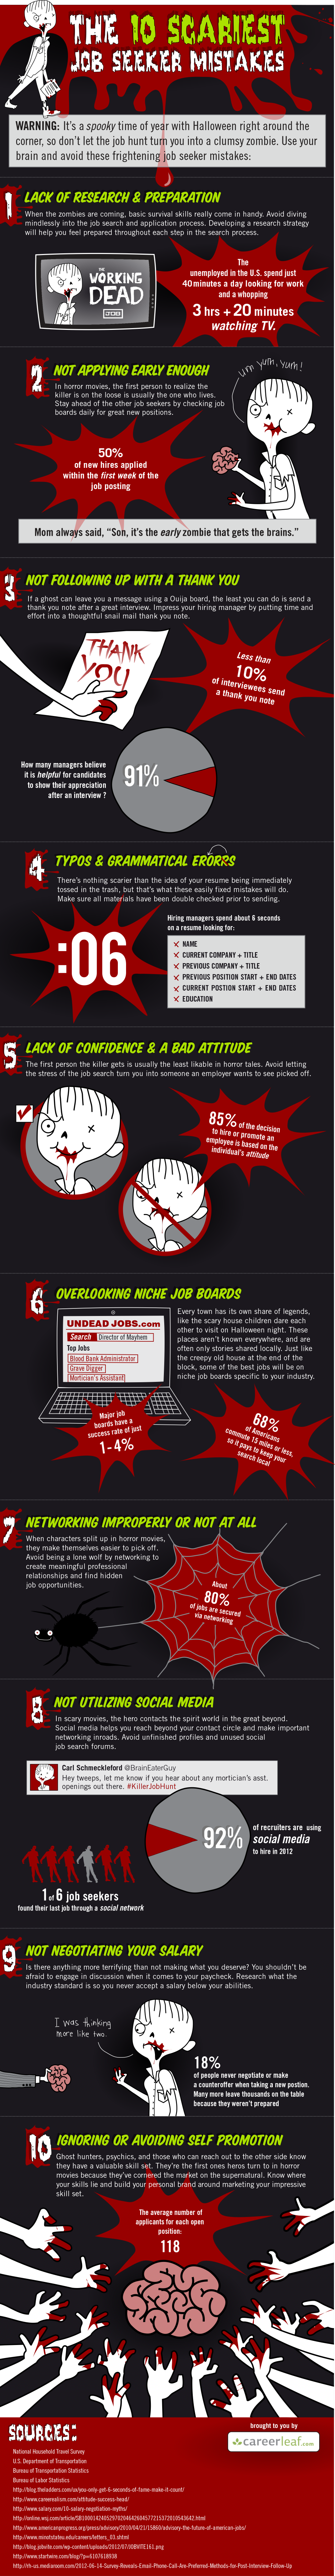 scary job seeker mistakes halloween